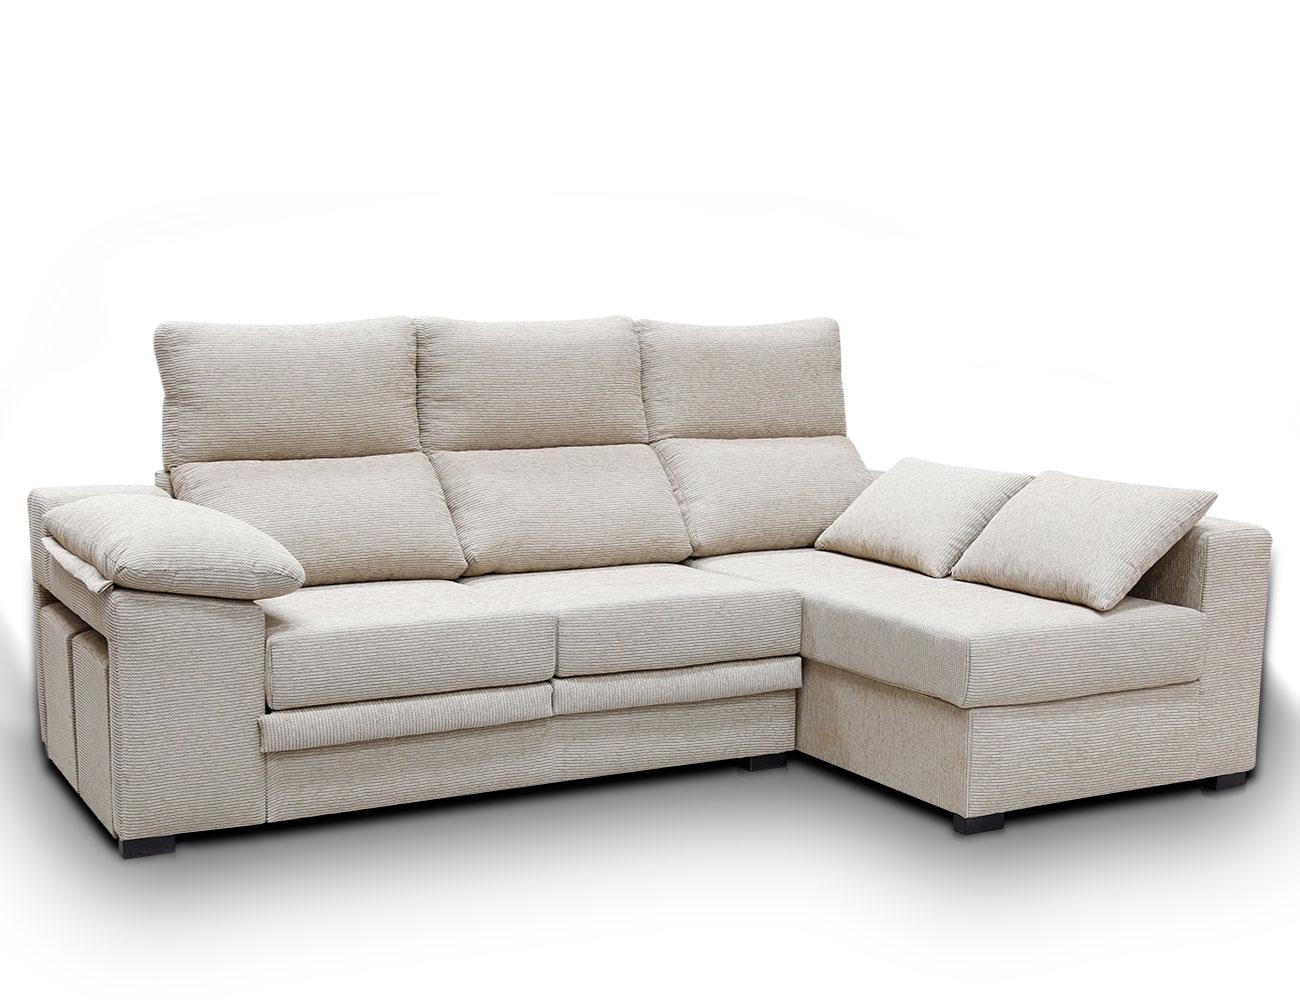 Sofa chaiselongue moderno puffs pardo 12